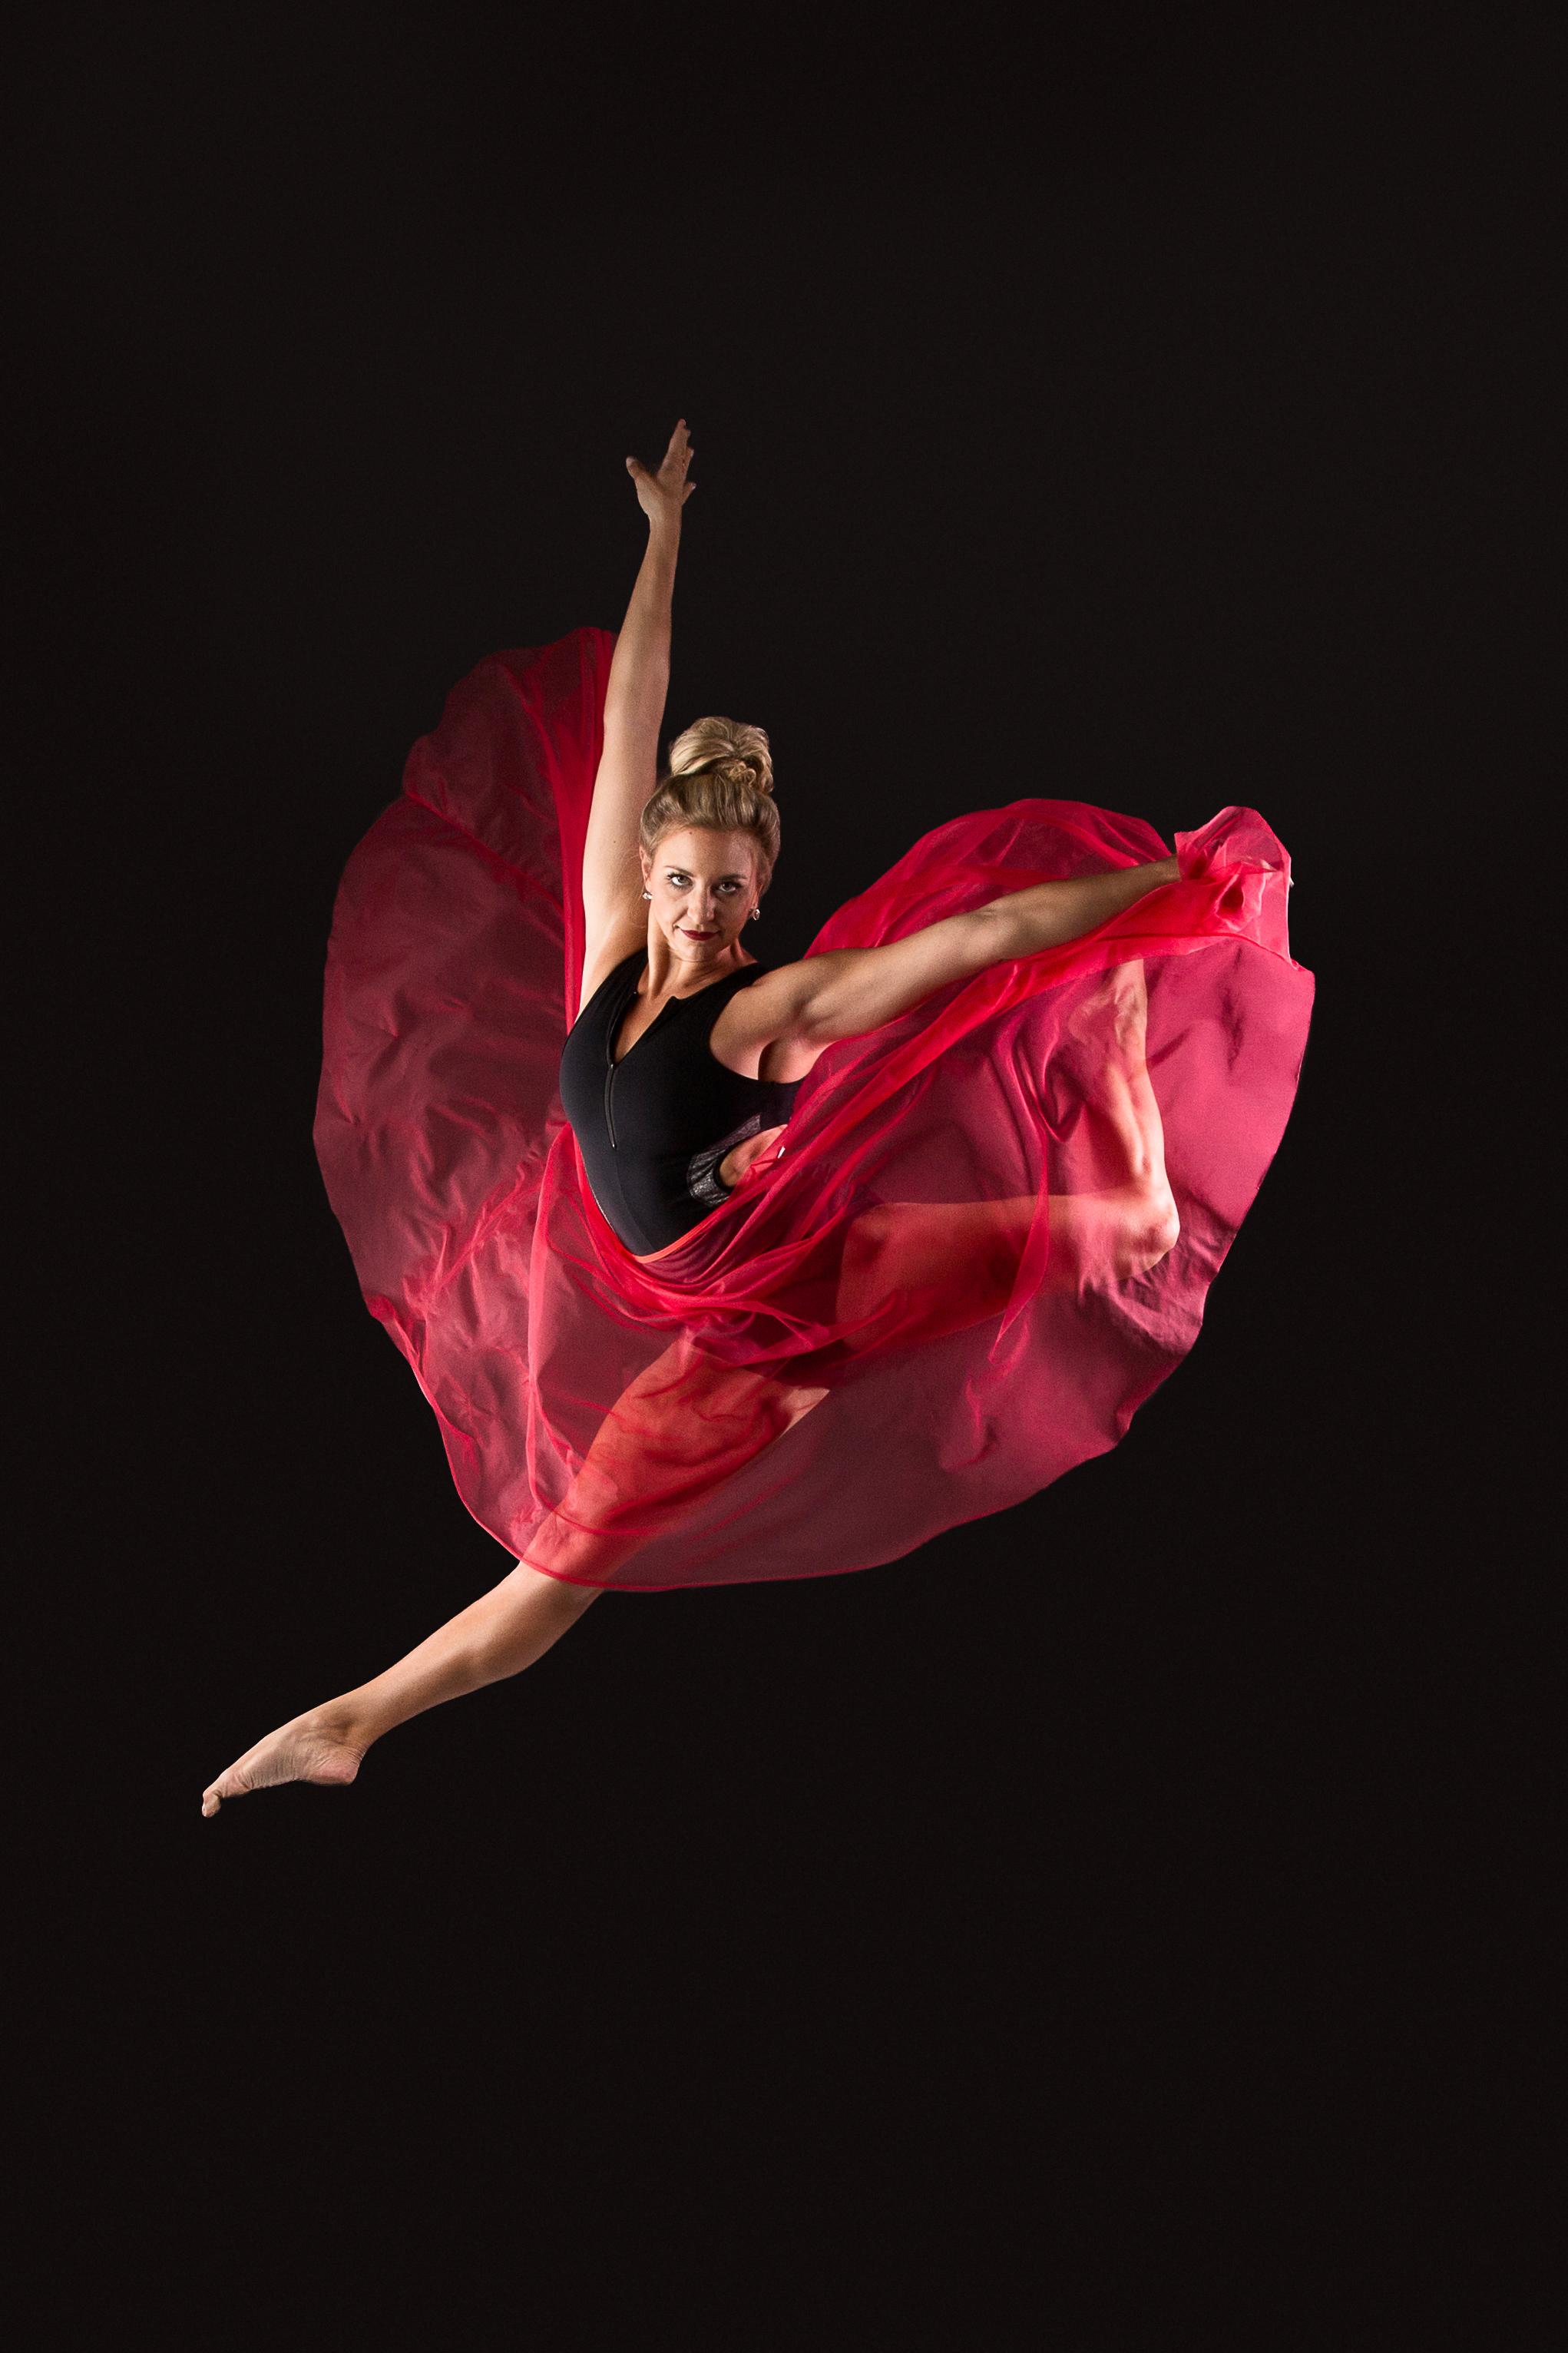 Morgan Rudolph Dance Image.jpeg